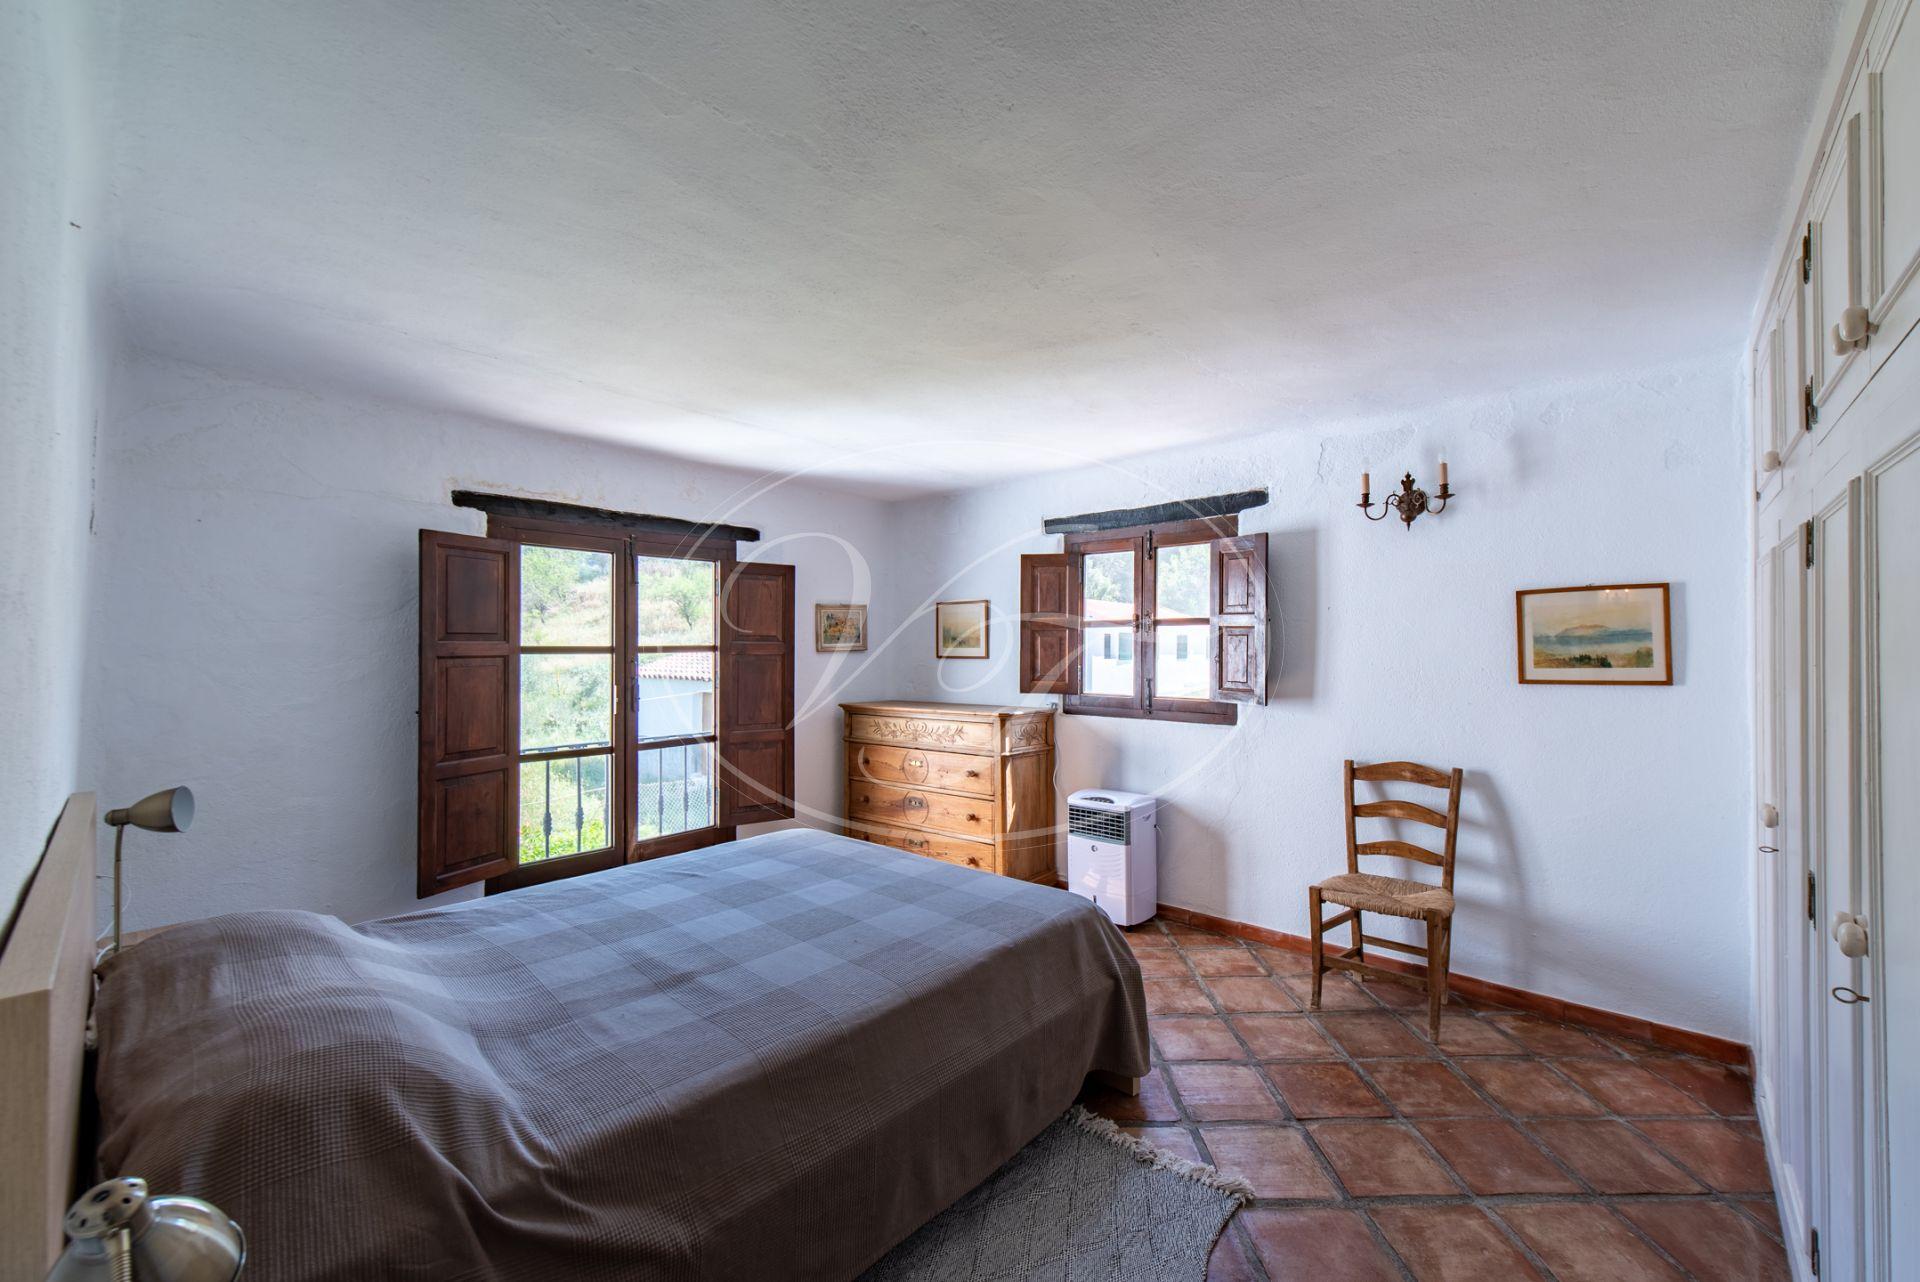 Estate for sale in Casares